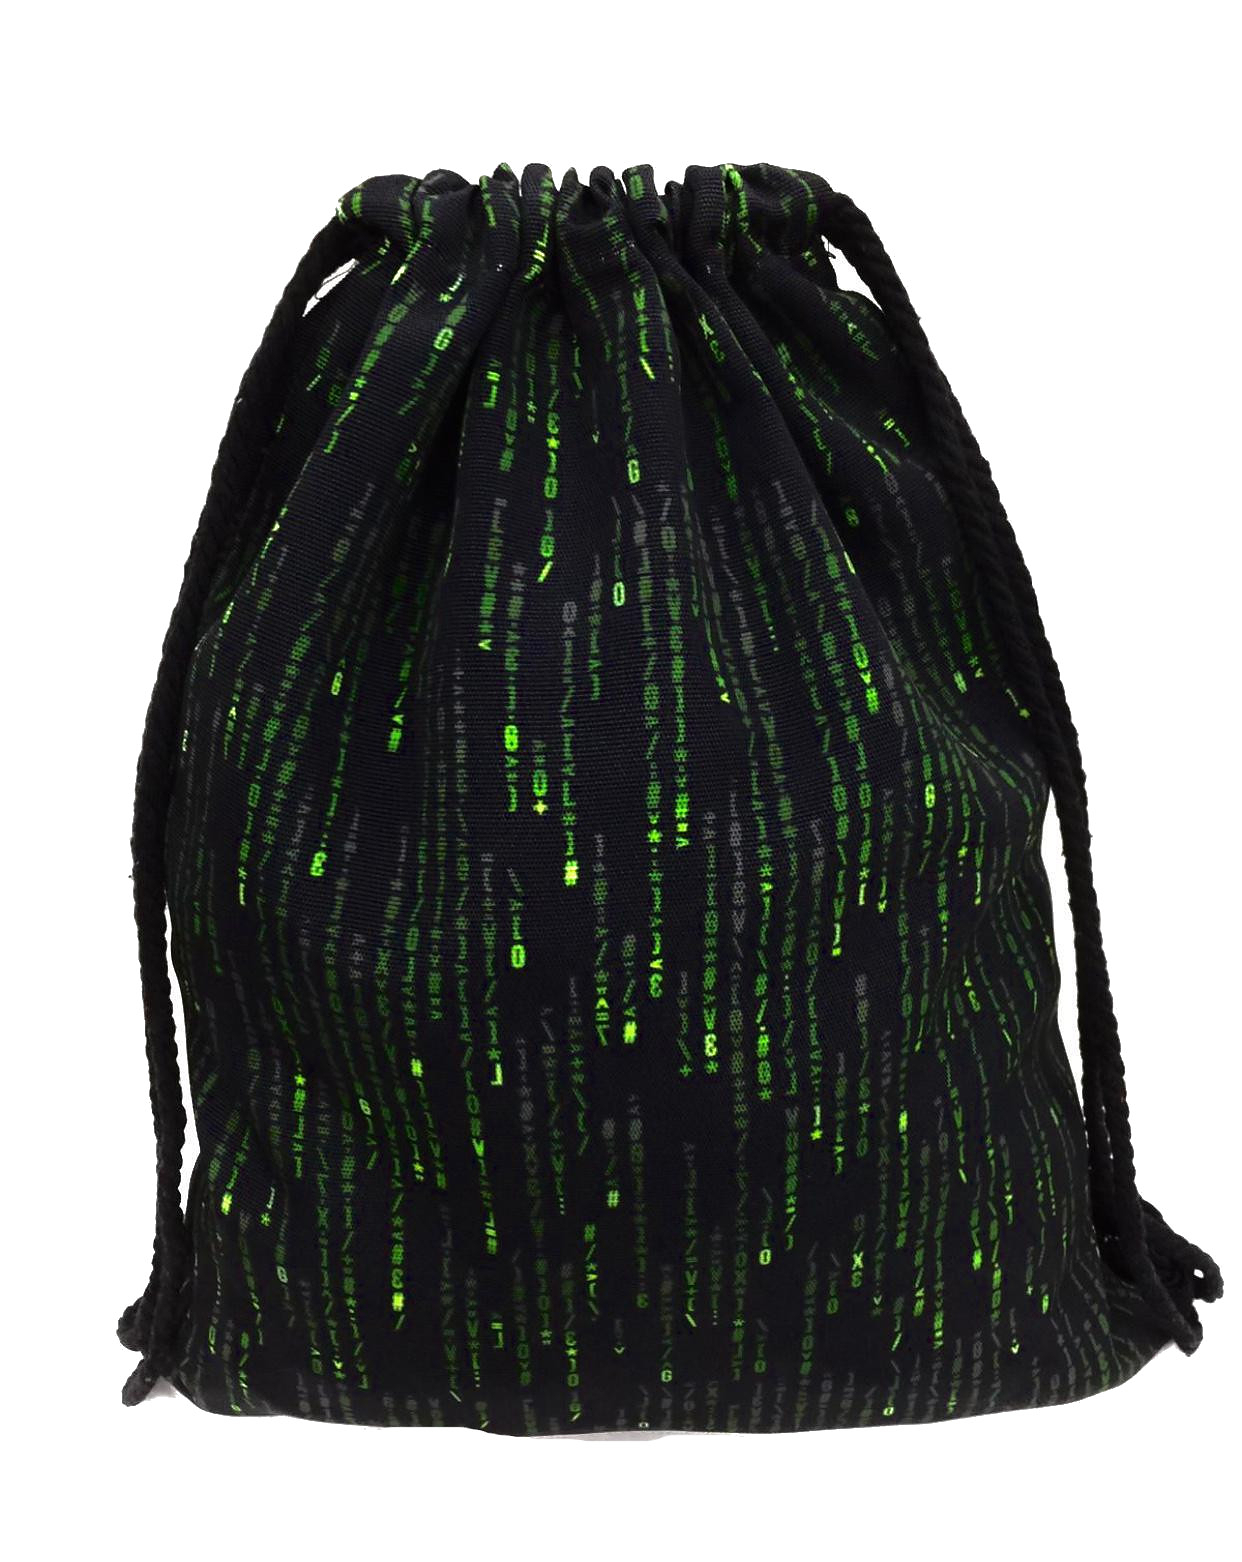 Taška - sáčok W-119 - Bruno Rossi černo-zelená UNI